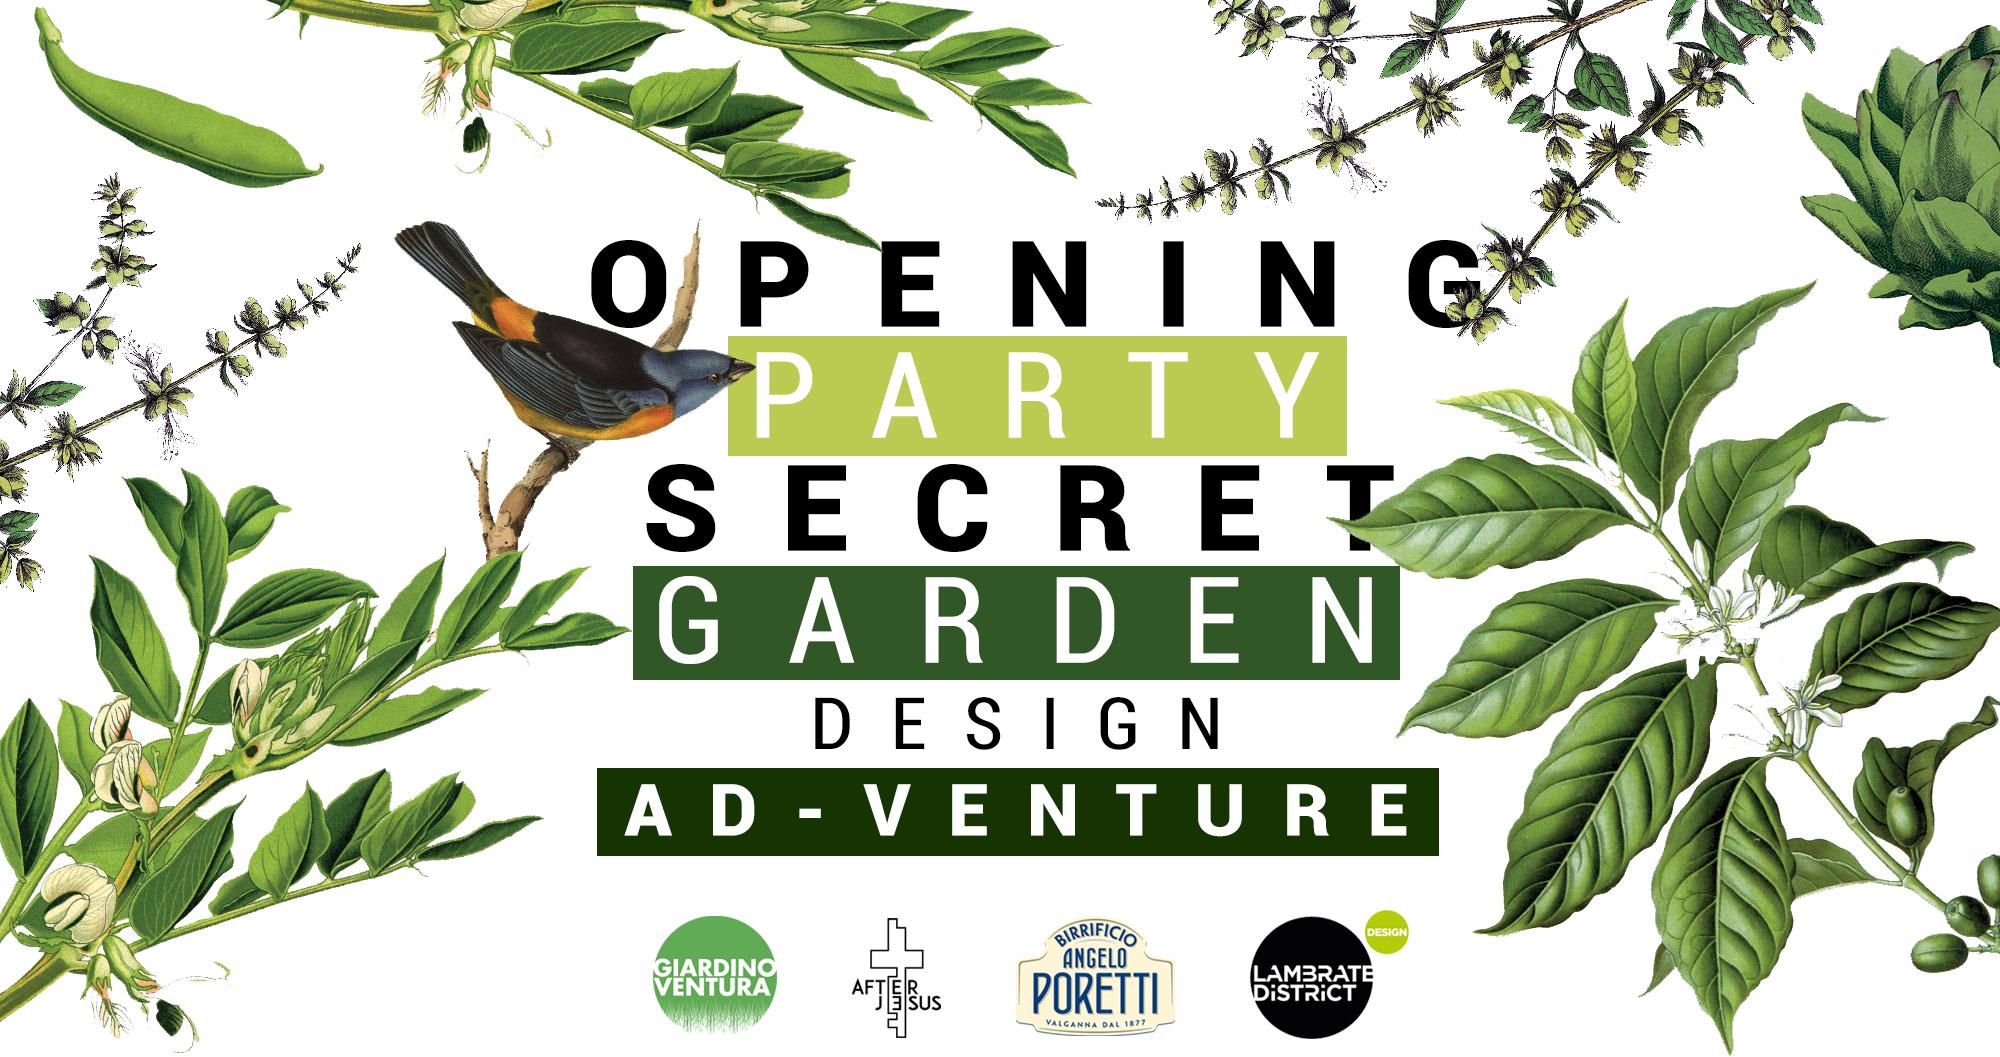 Opening Party Secret Garden / Design Ad-Venture